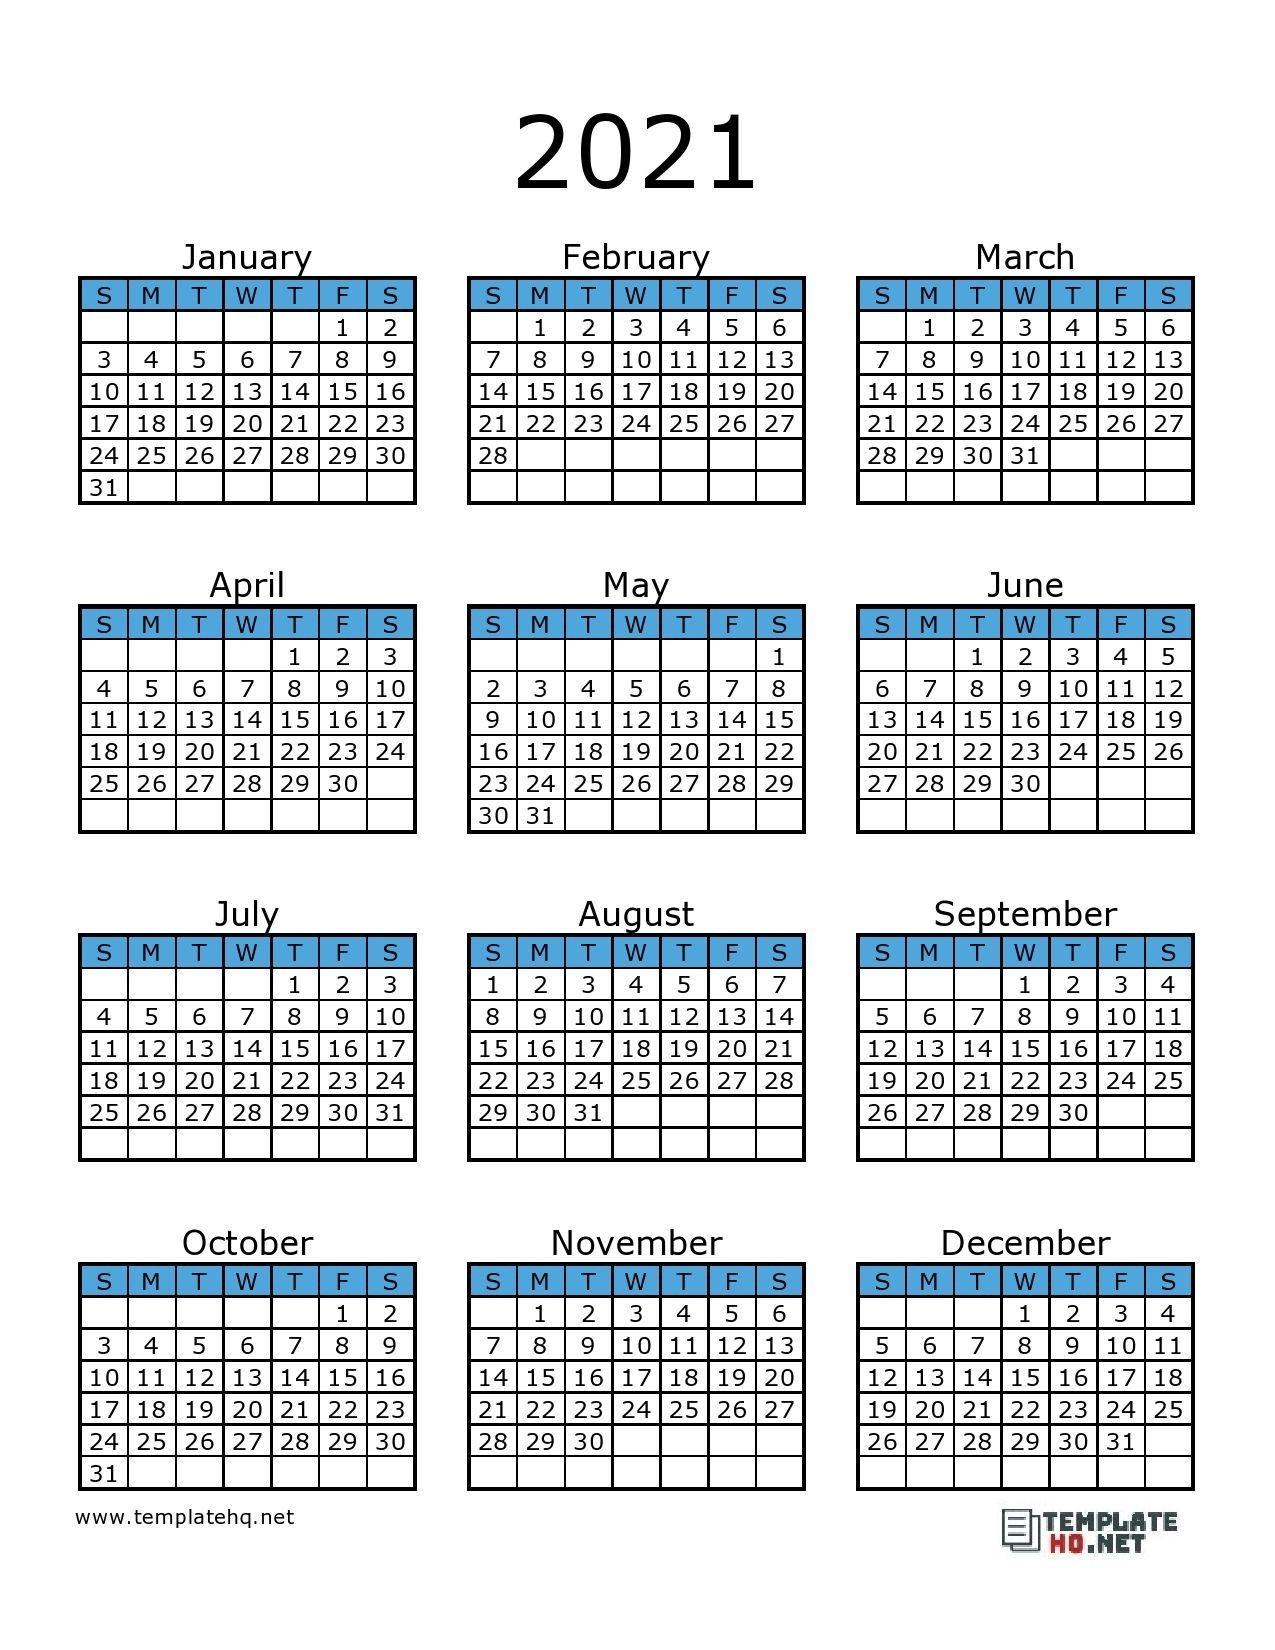 Printable 2021 F-1 Schedule - Example Calendar Printable  Easy To Print 2021 Calendar